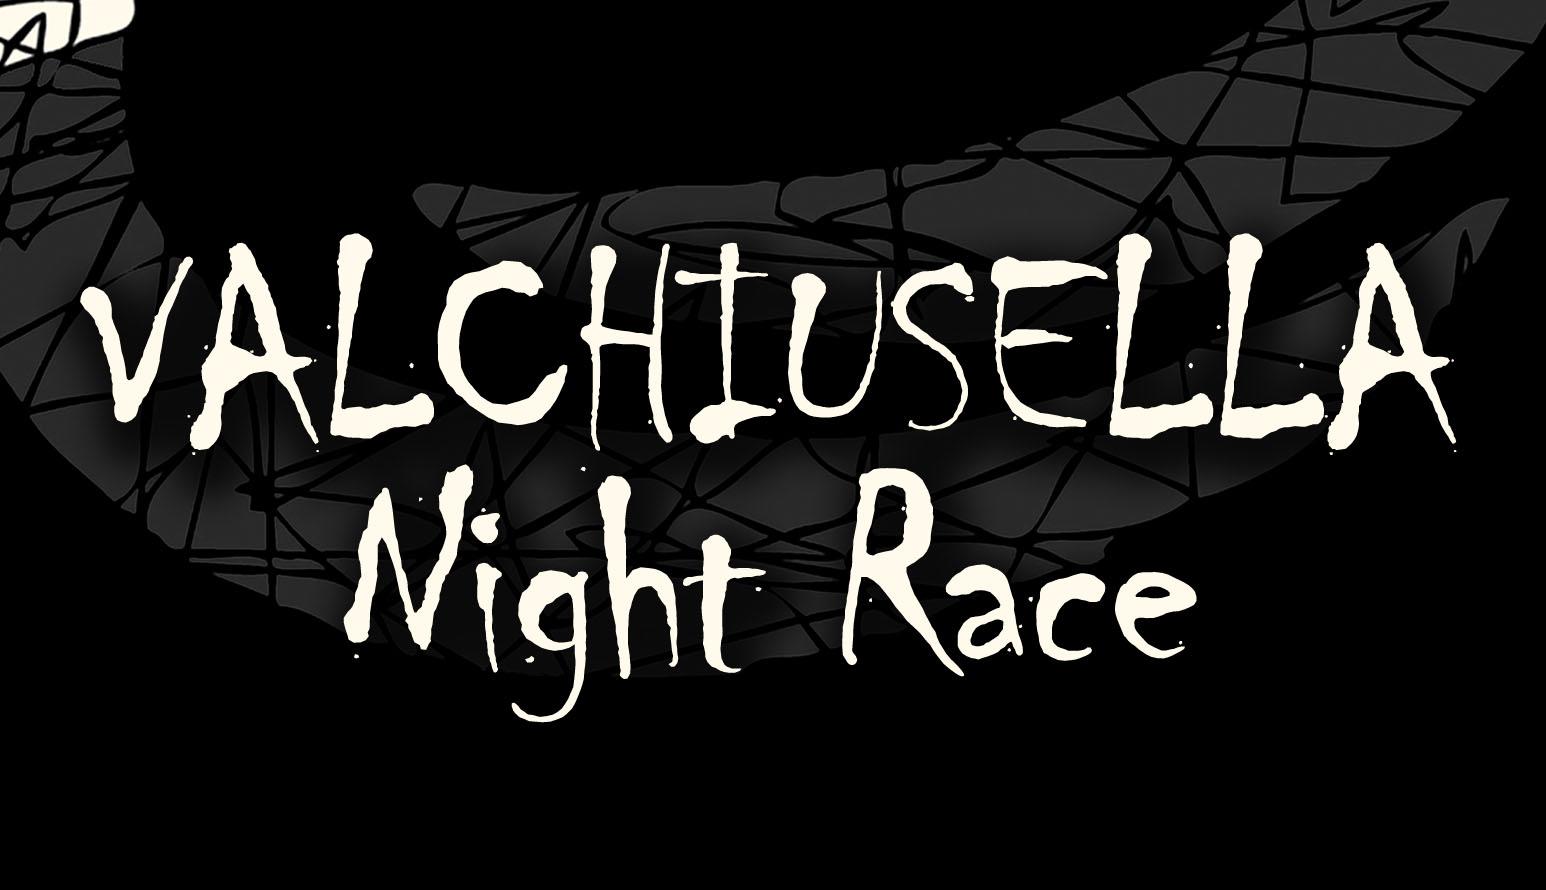 Circuito Night Run : Lpa night run abre inscripciones con los corredores